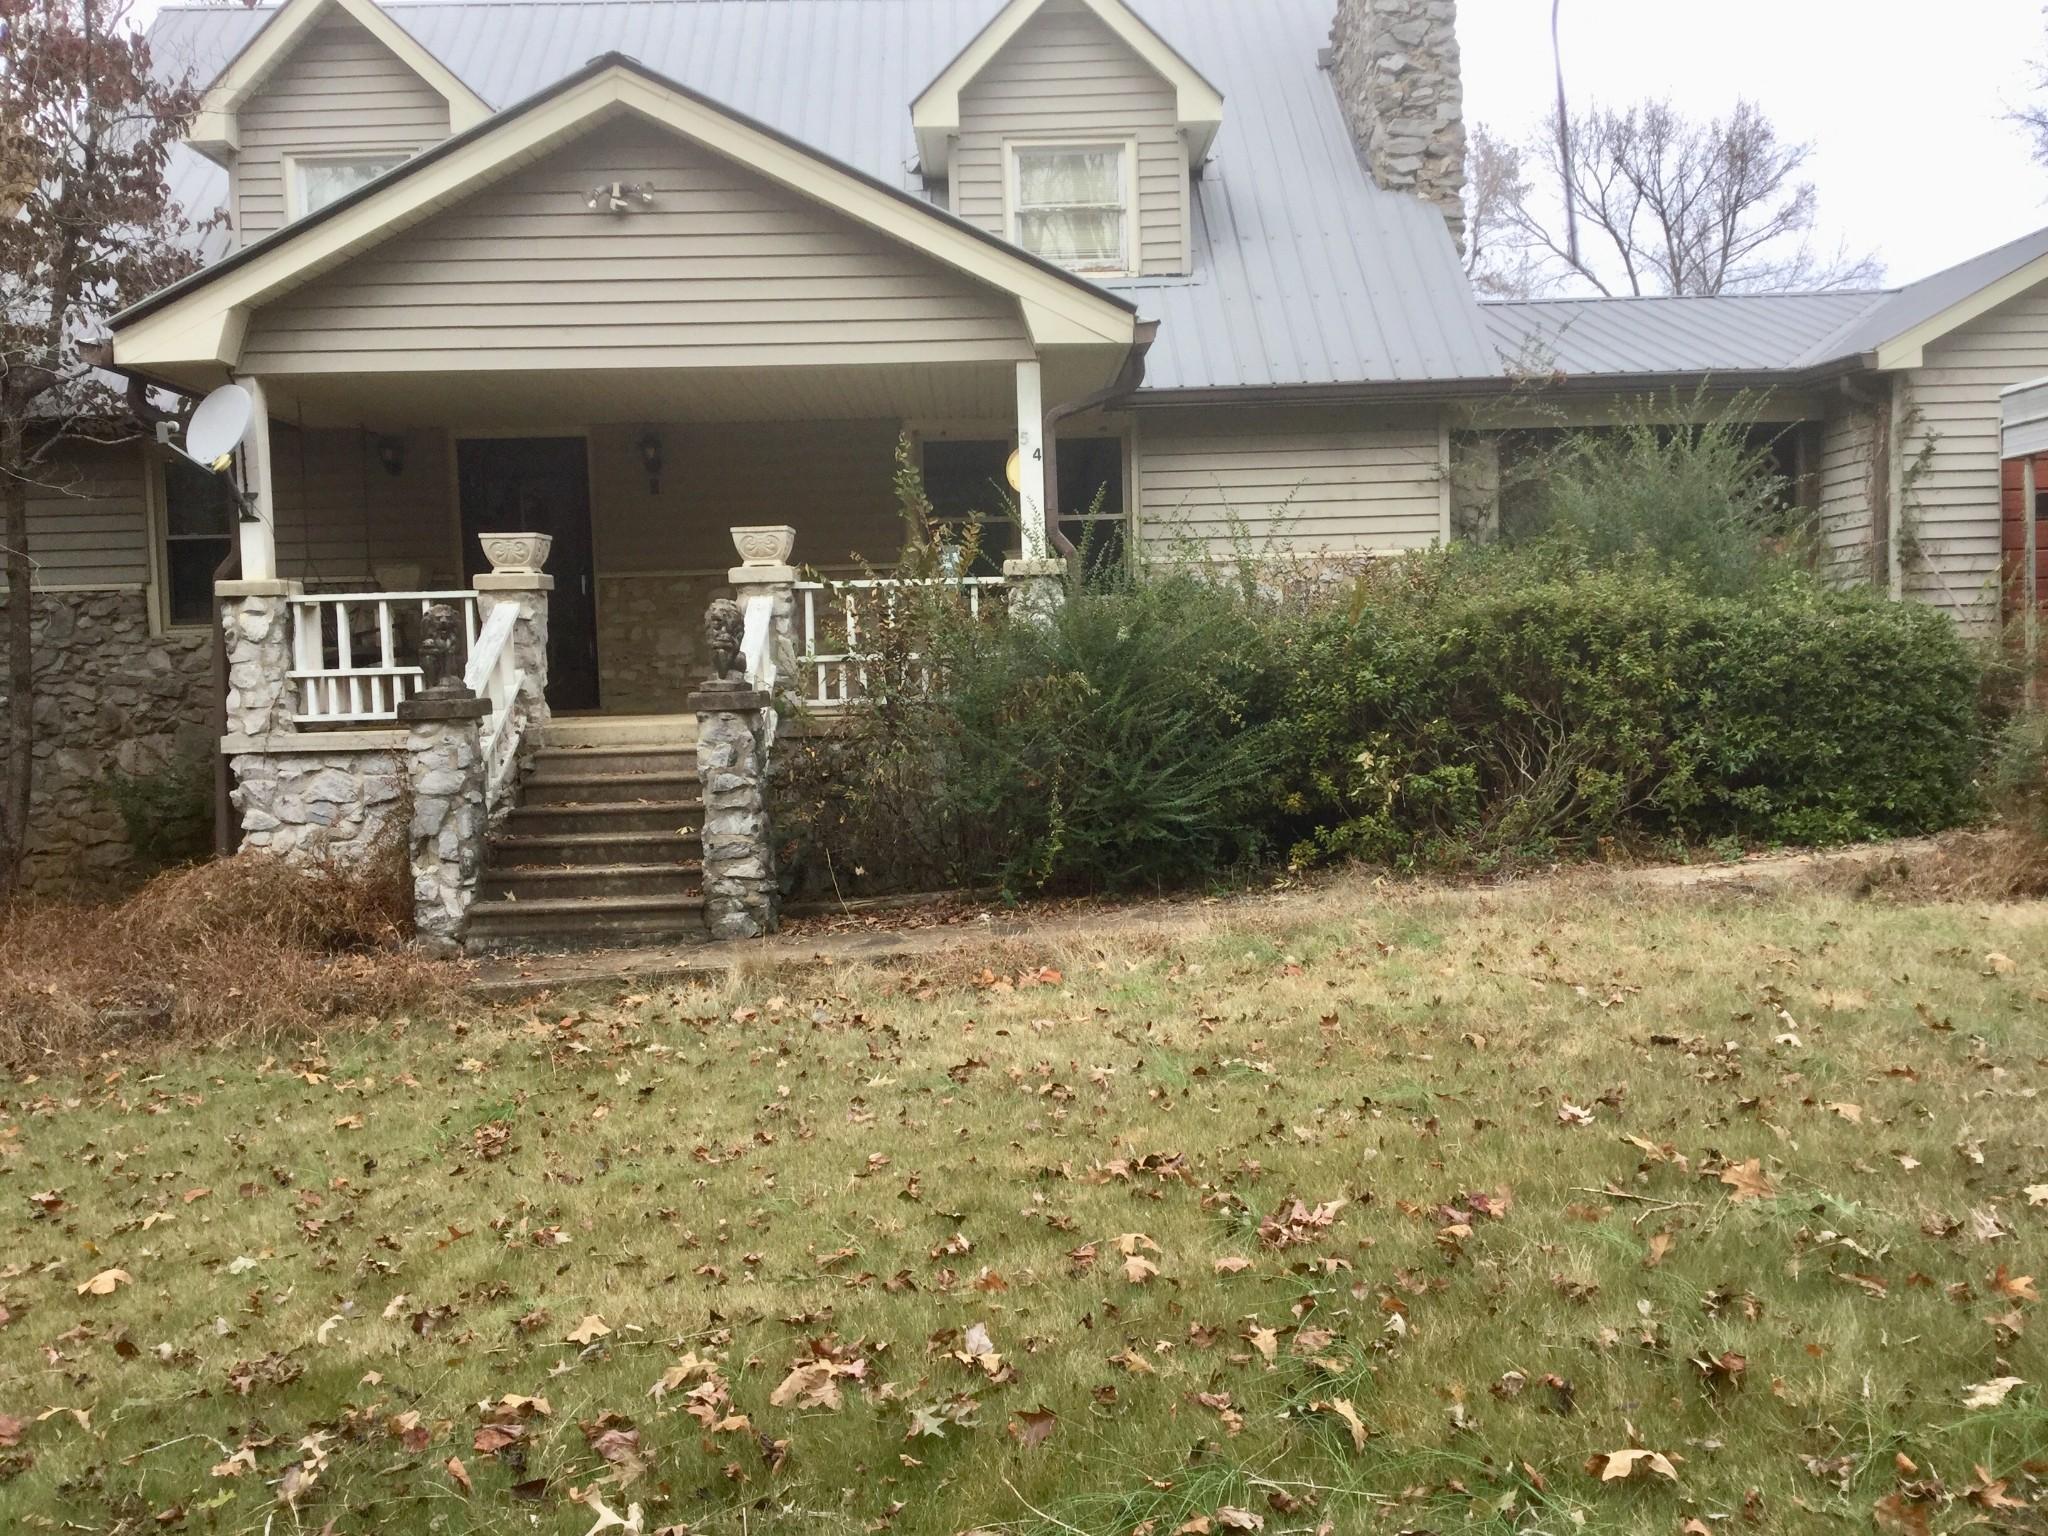 54 Woodvine Ln, Waverly, TN 37185 - Waverly, TN real estate listing